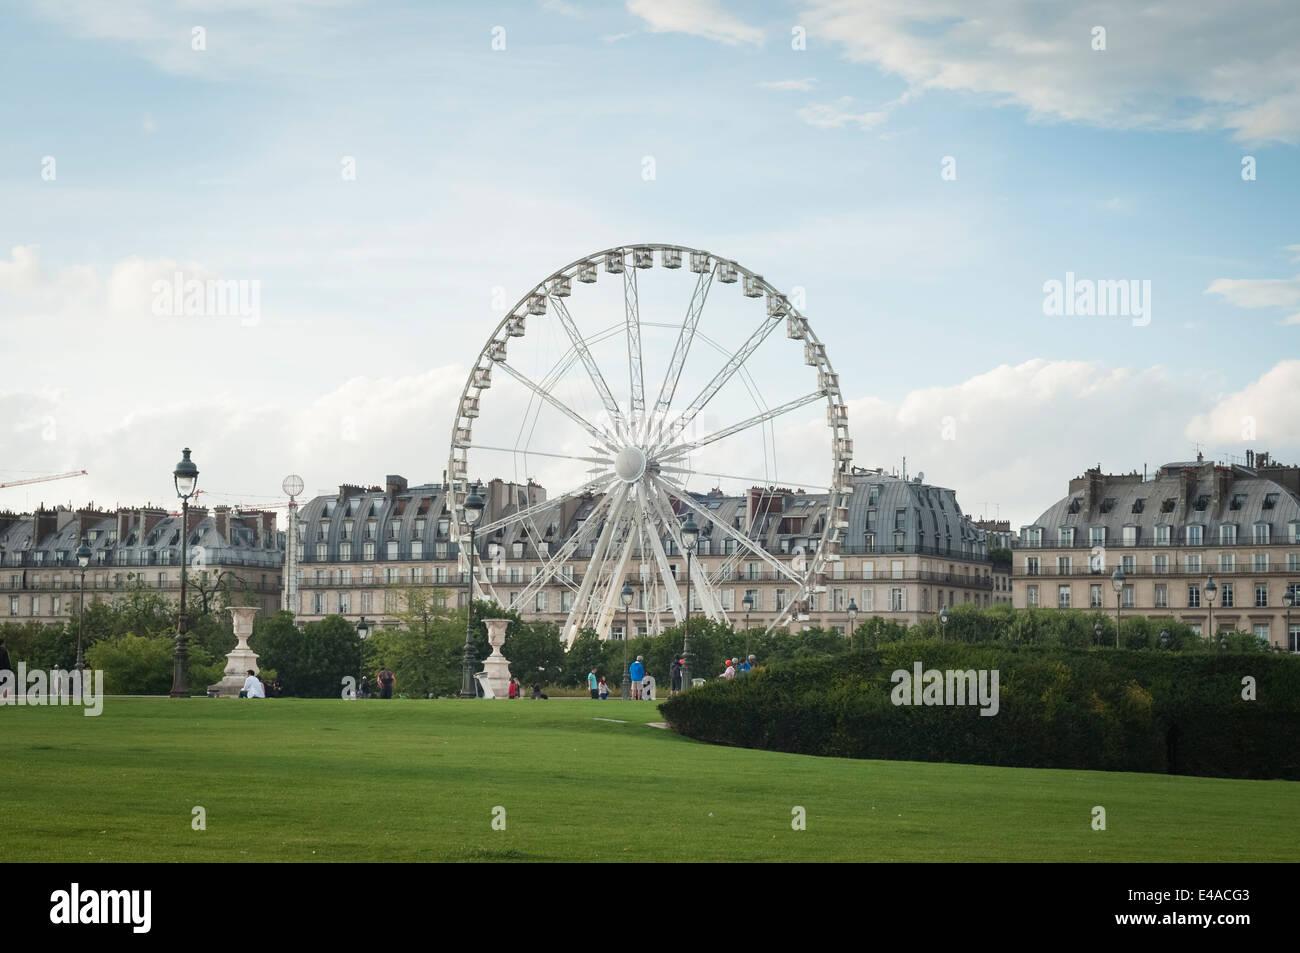 Tuileries garden, Paris, France. - Stock Image